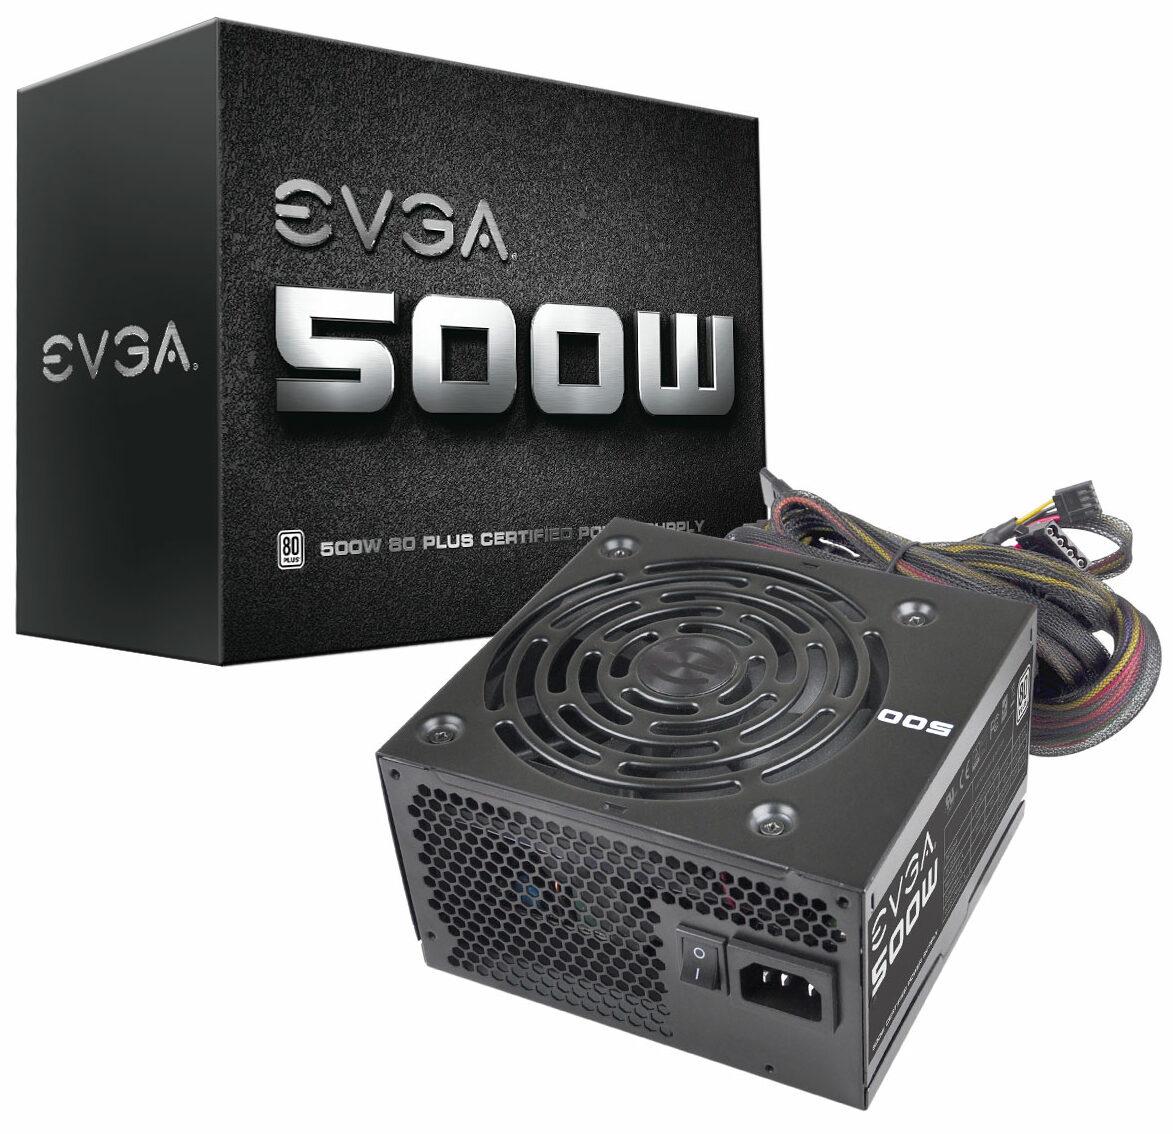 EVGA 100-W1-0500-KR